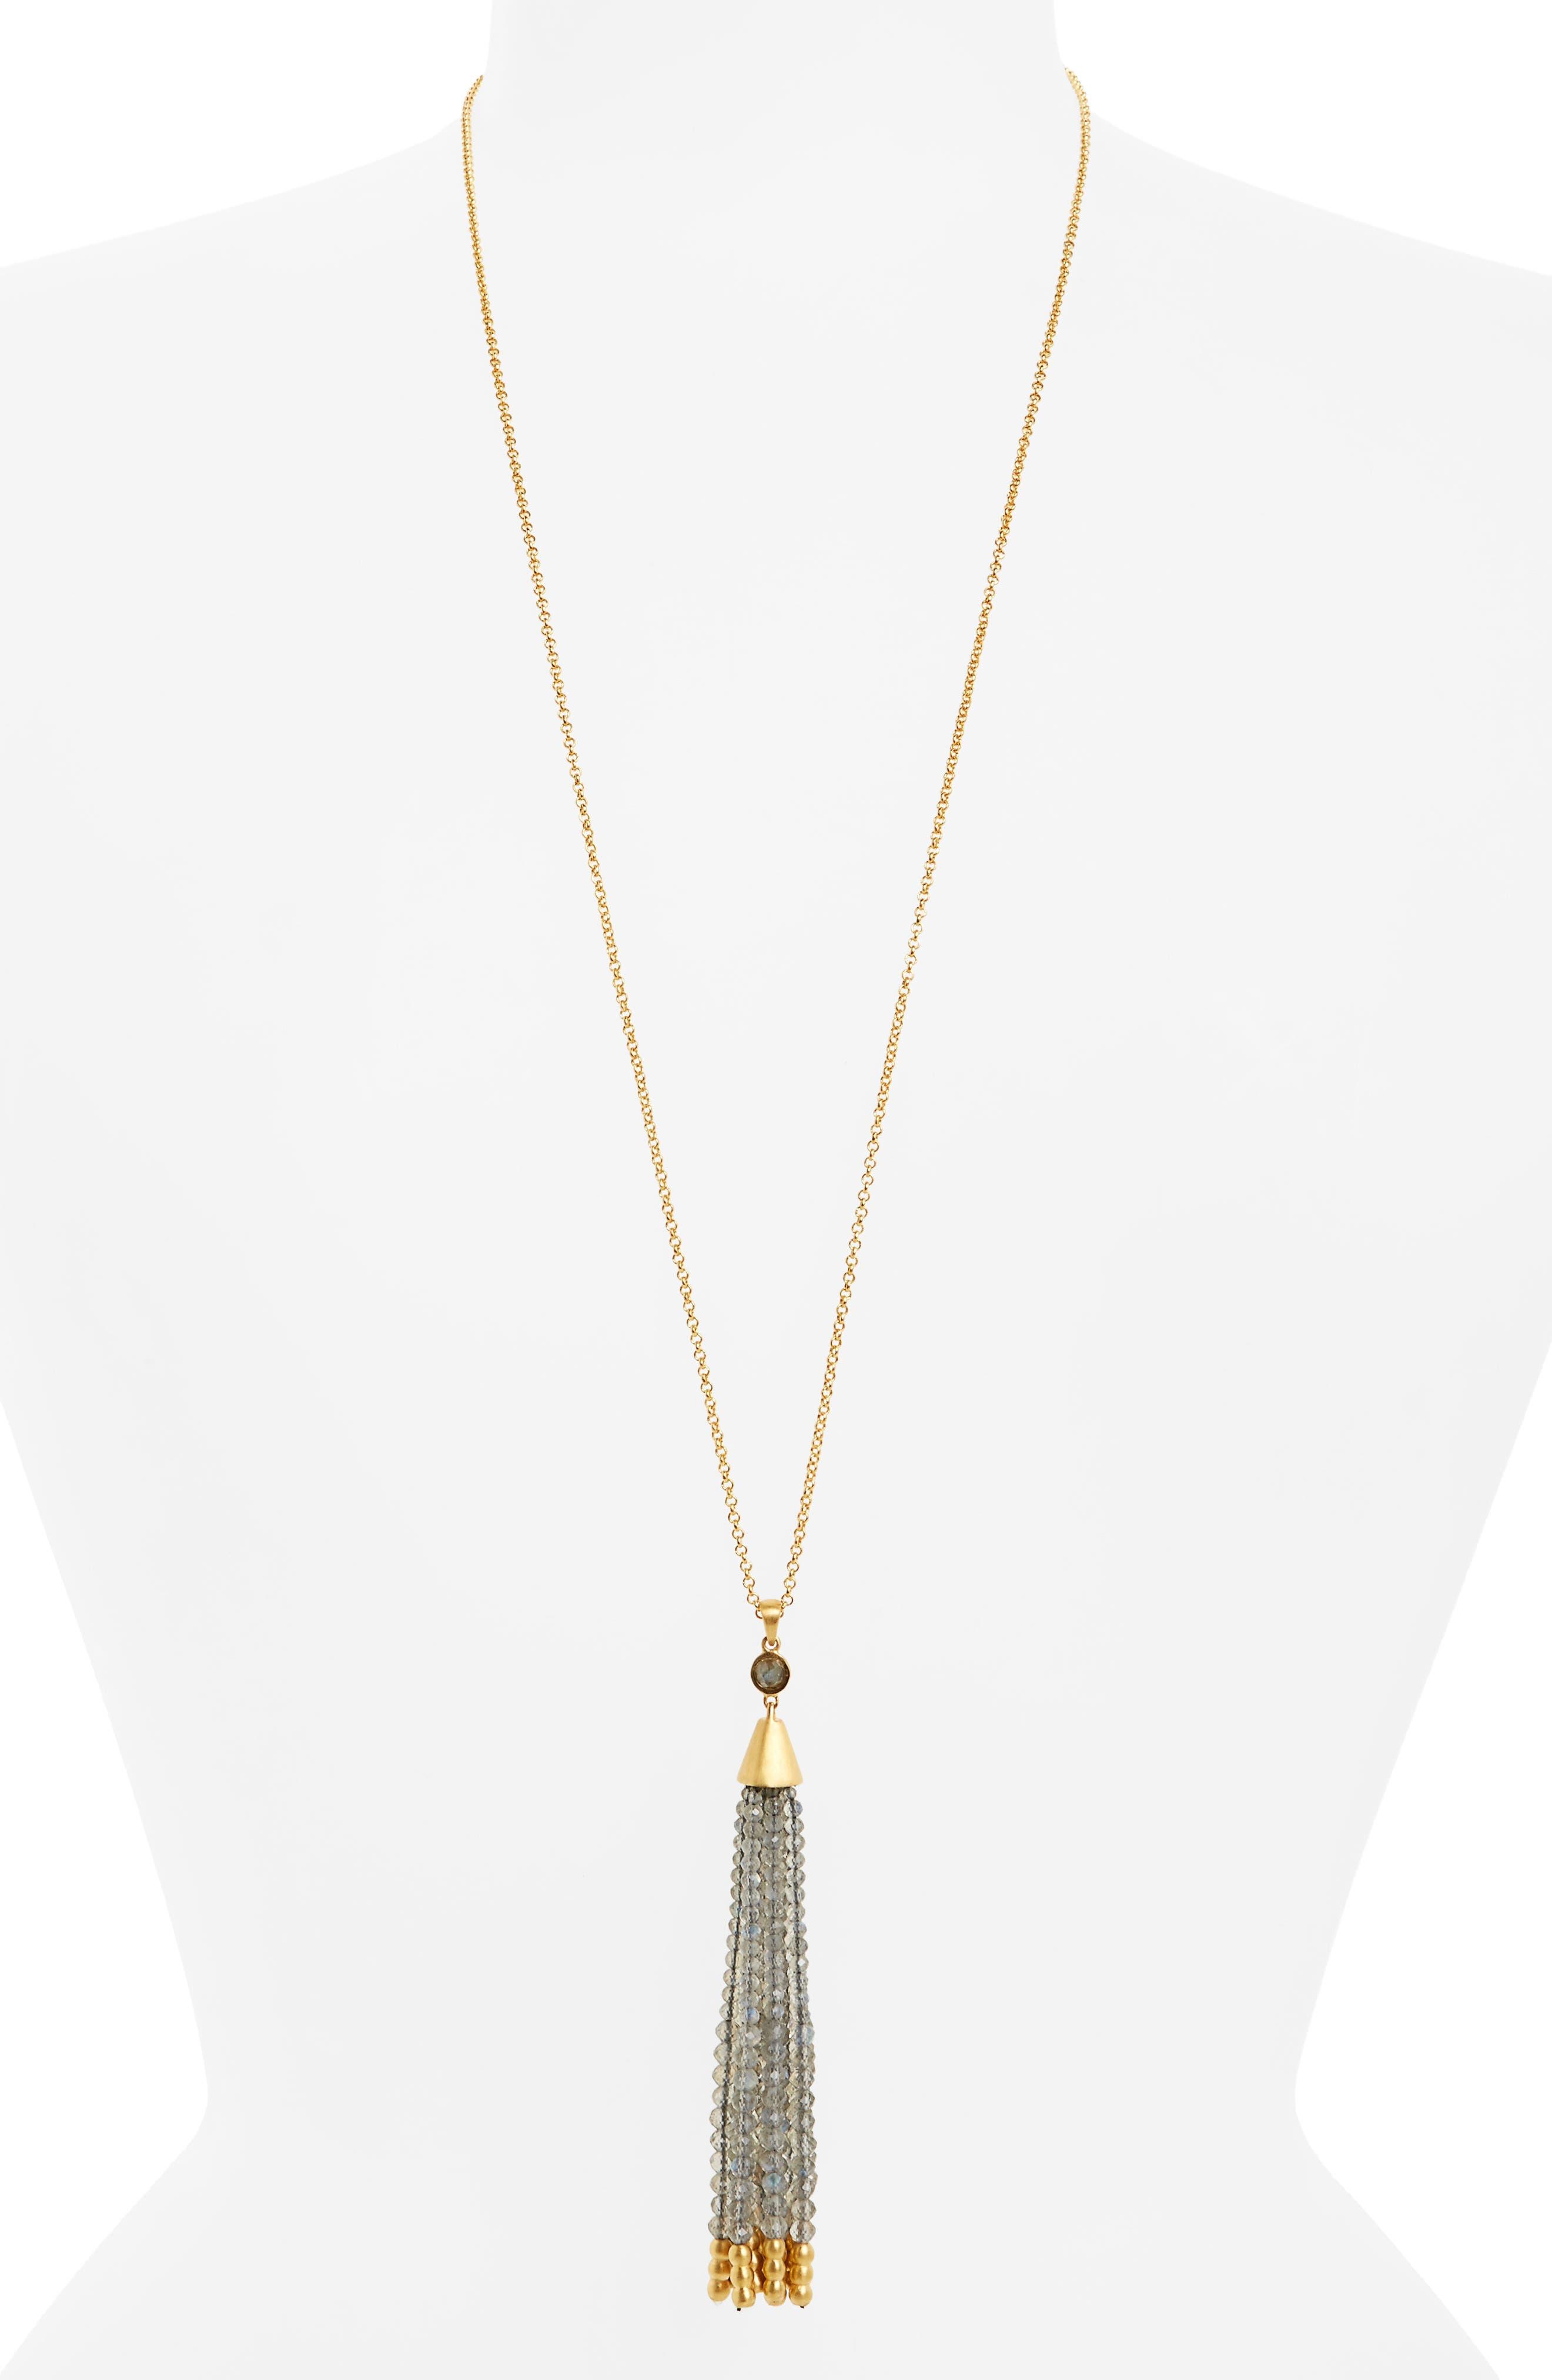 Samba Tassel Pendant Necklace,                             Main thumbnail 1, color,                             LABRADORITE/ GOLD